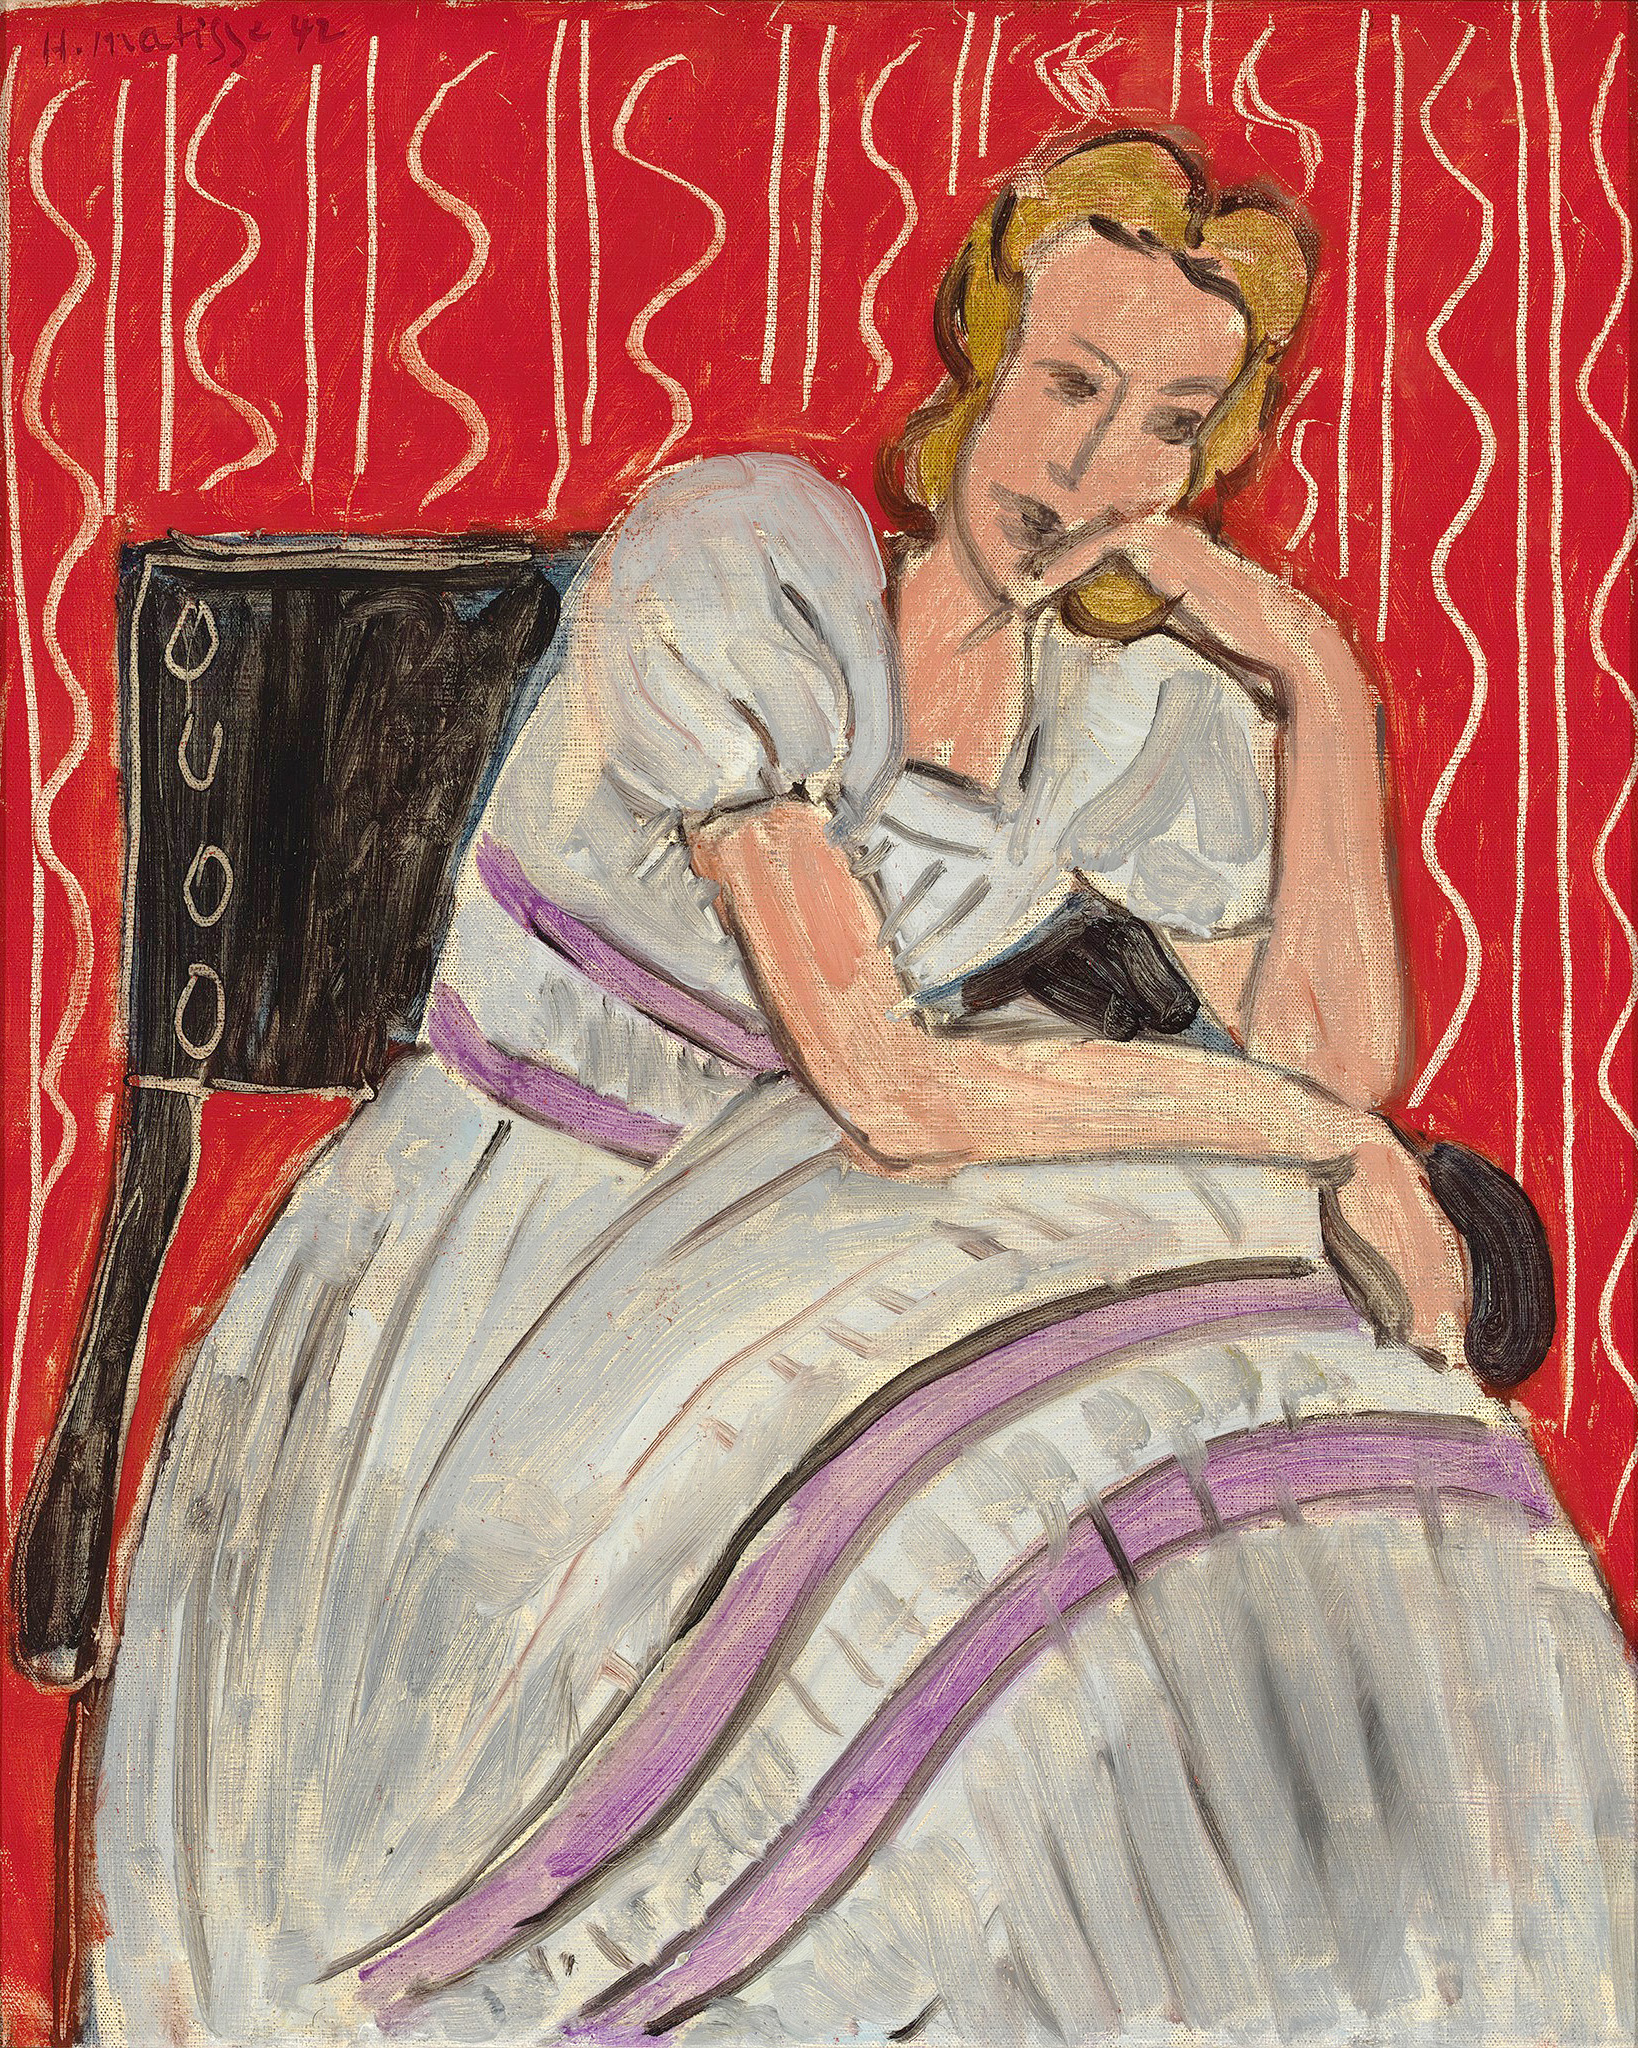 Hammer Galleries:Henri Matisse, Jeune femme assise en robe gris, 1942